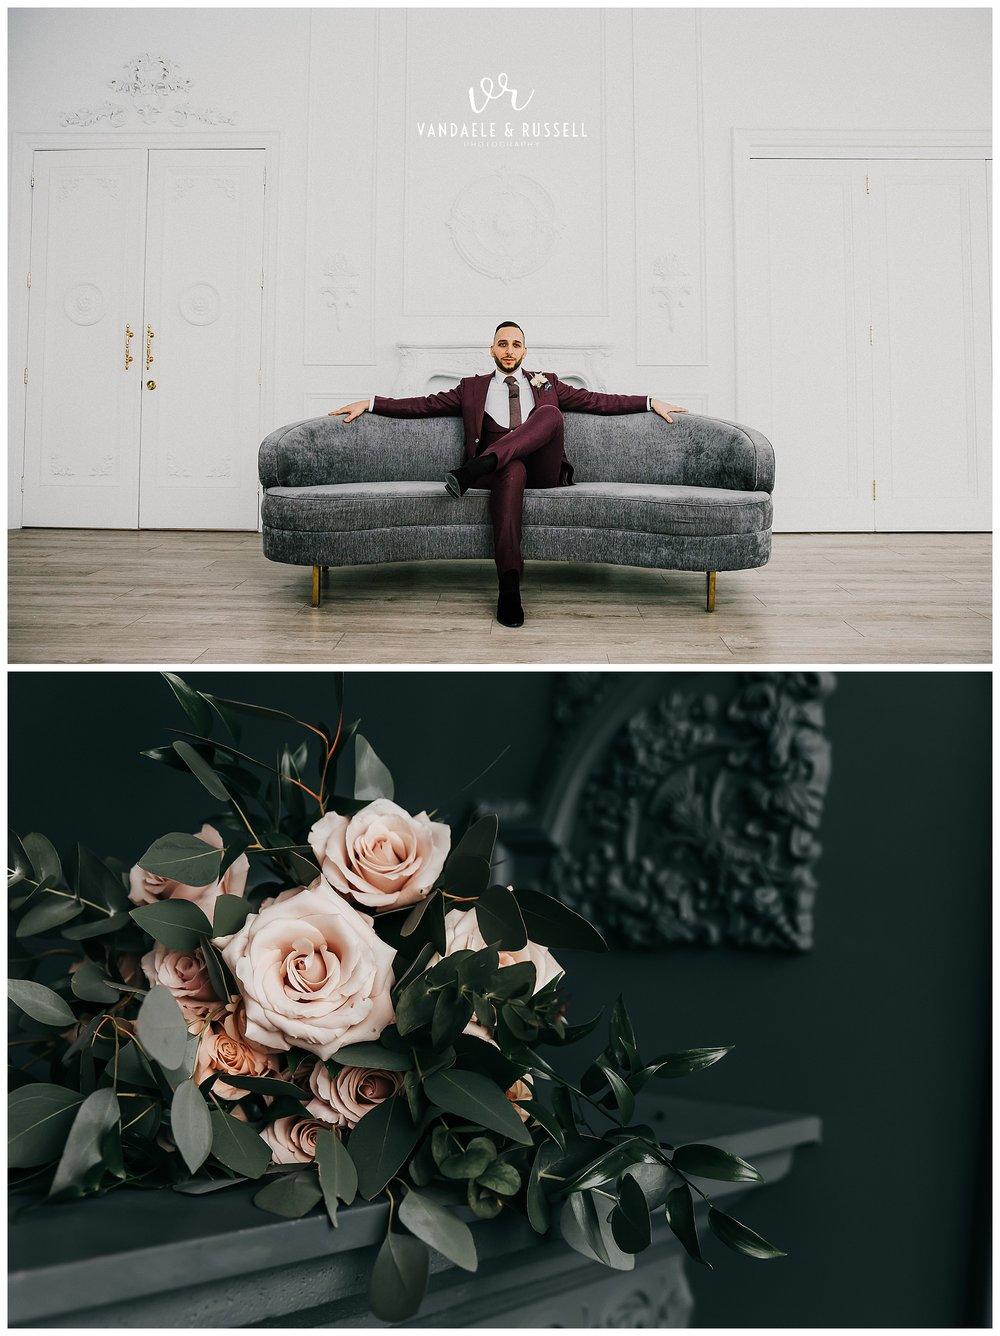 Joanna-Christos-Grand-Luxe-Wedding-Photos-Mint-Room-Toronto-VanDaele-Russell_0080.jpg